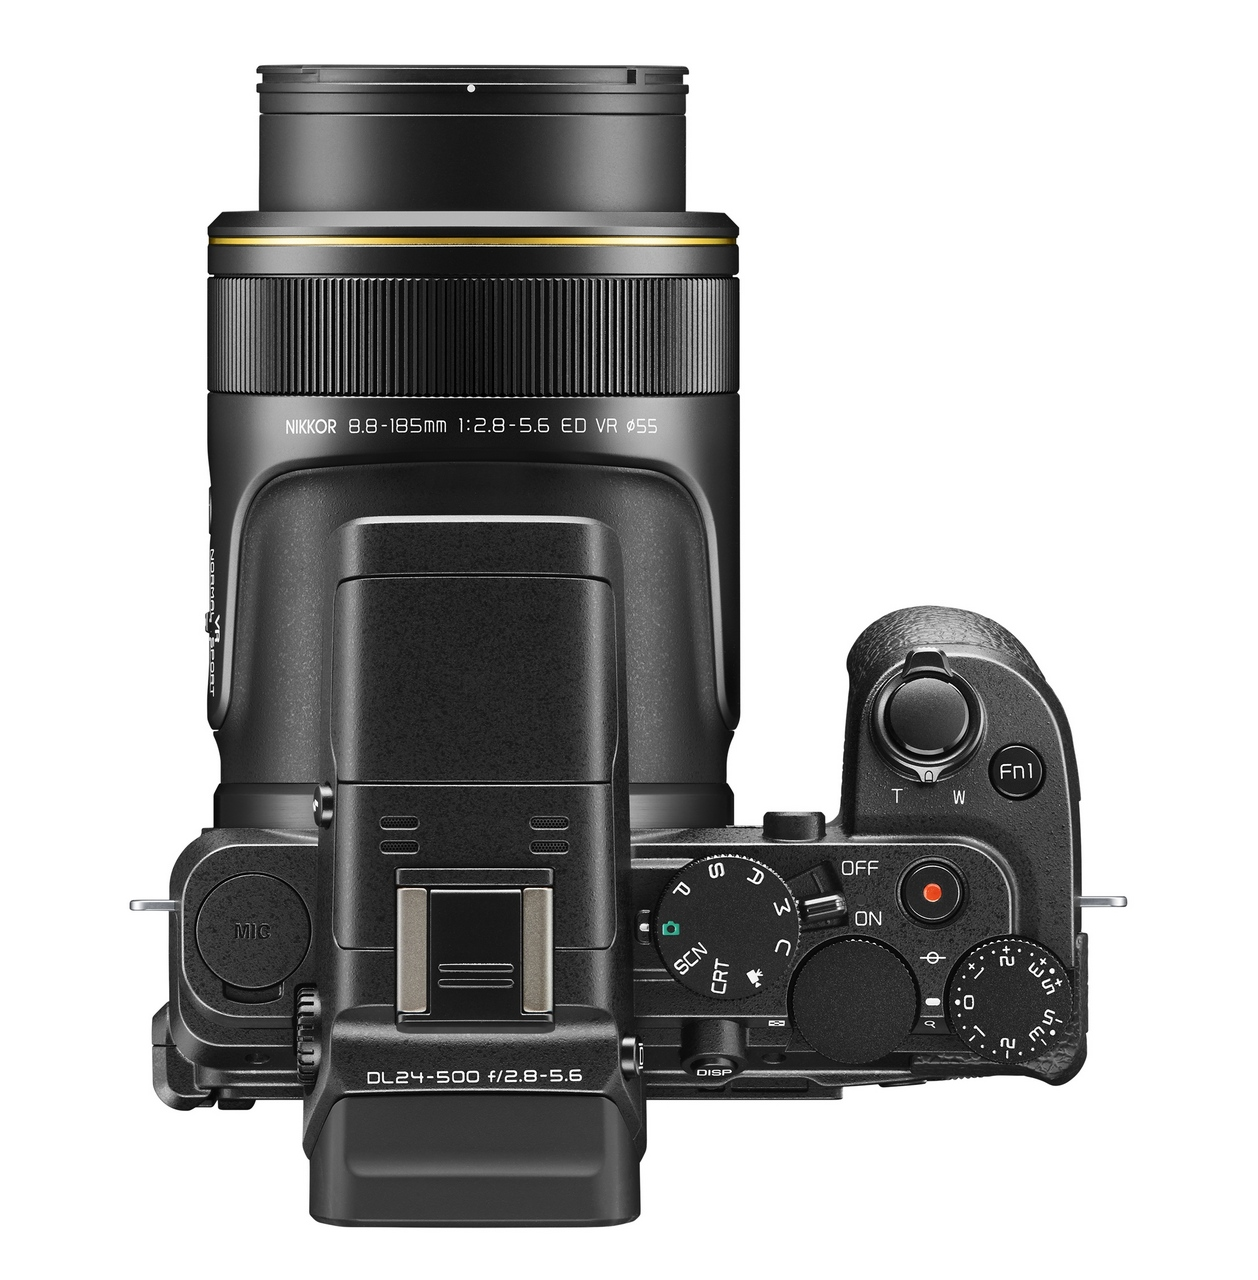 Nikon DL 24-500 f2.8-5.6